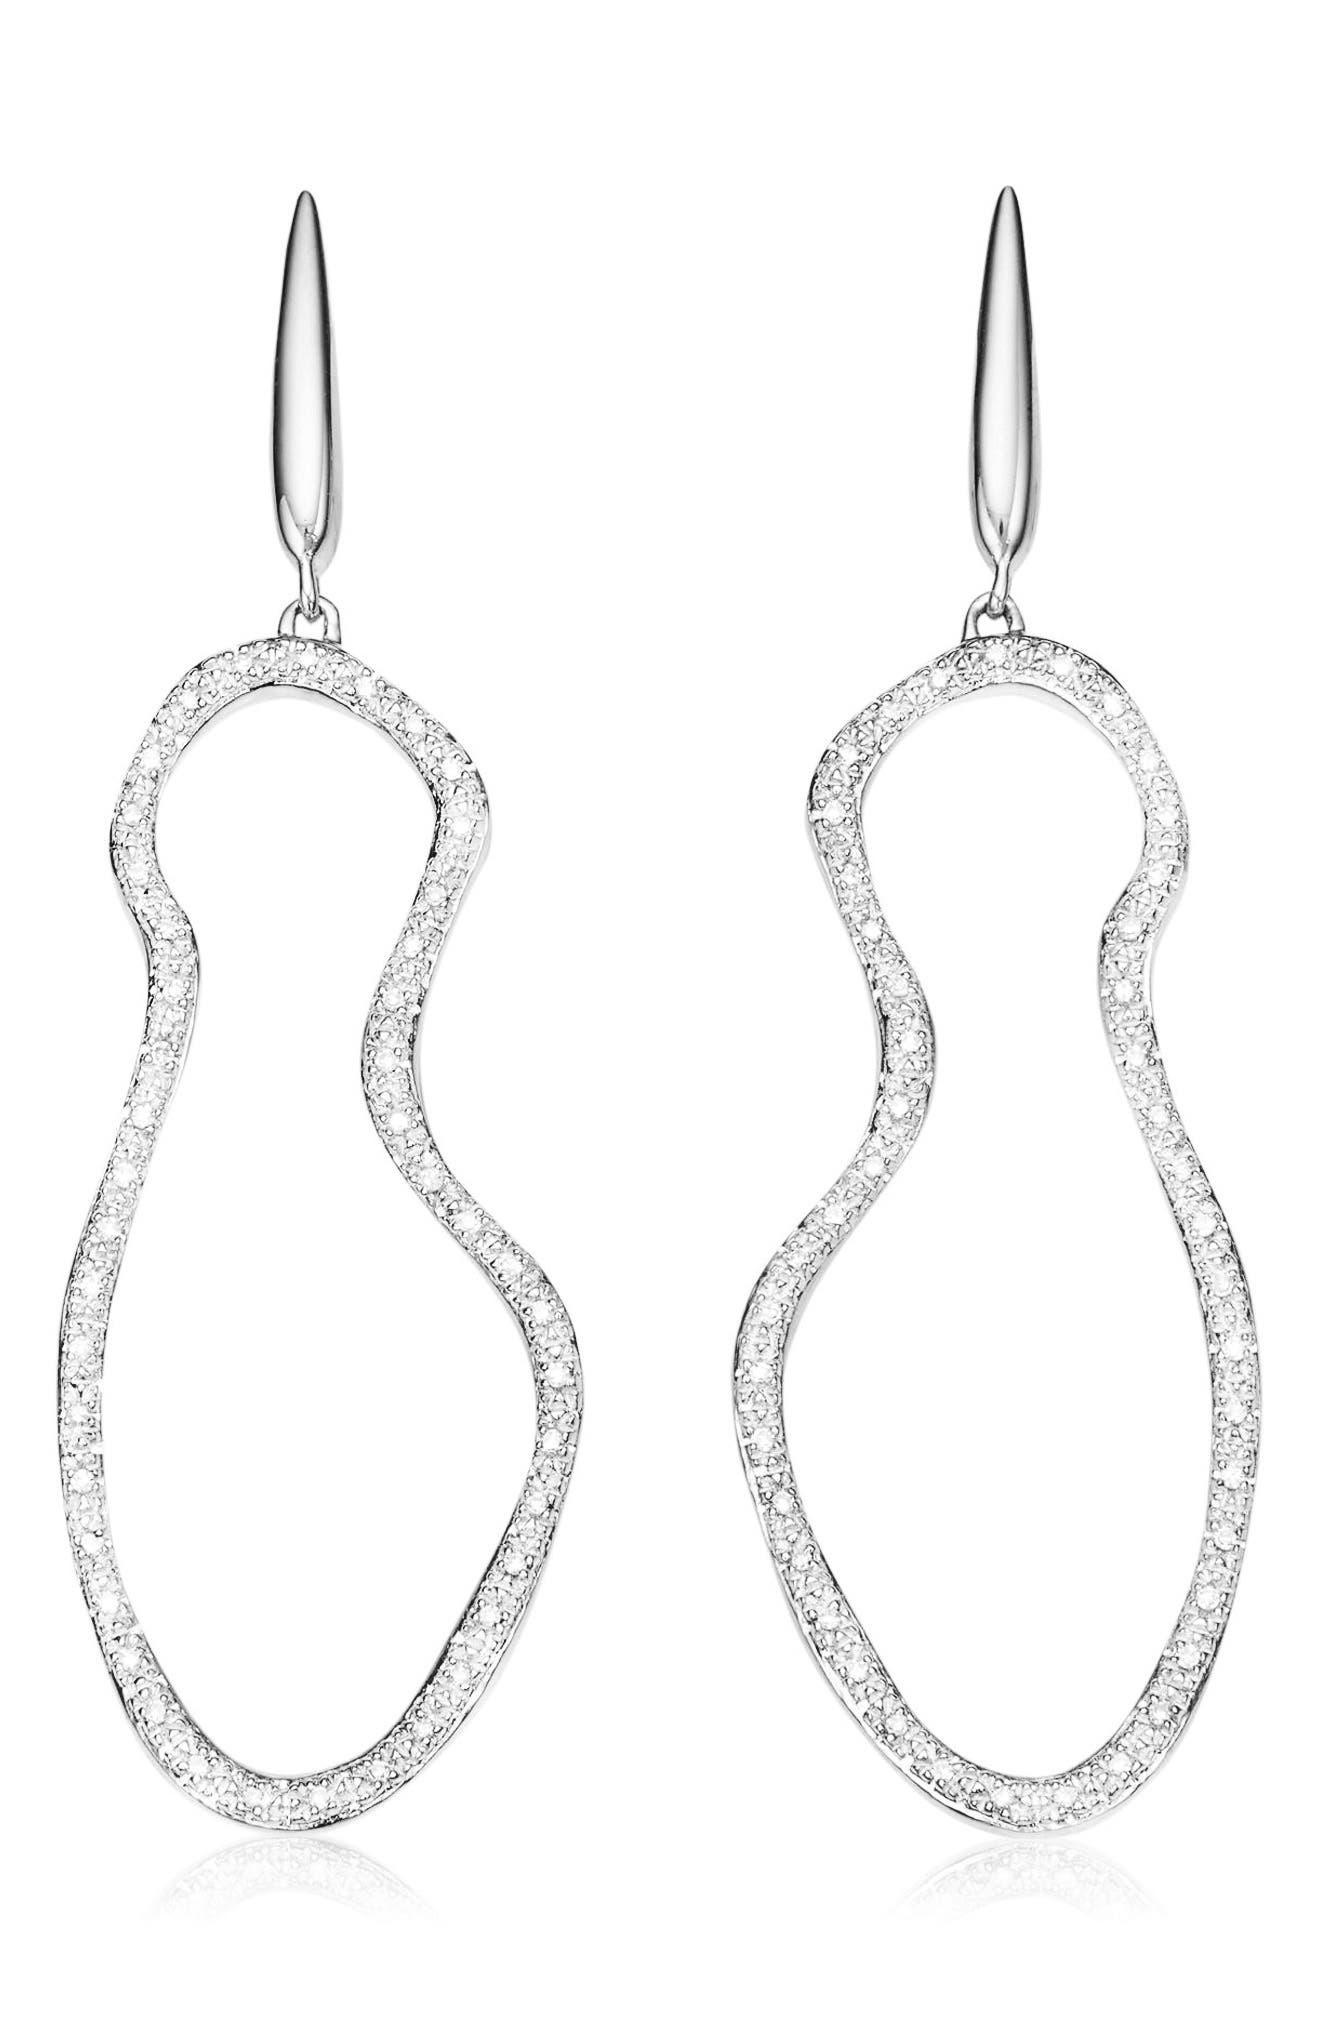 Riva Pod Diamond Cocktail Earrings,                         Main,                         color, Silver